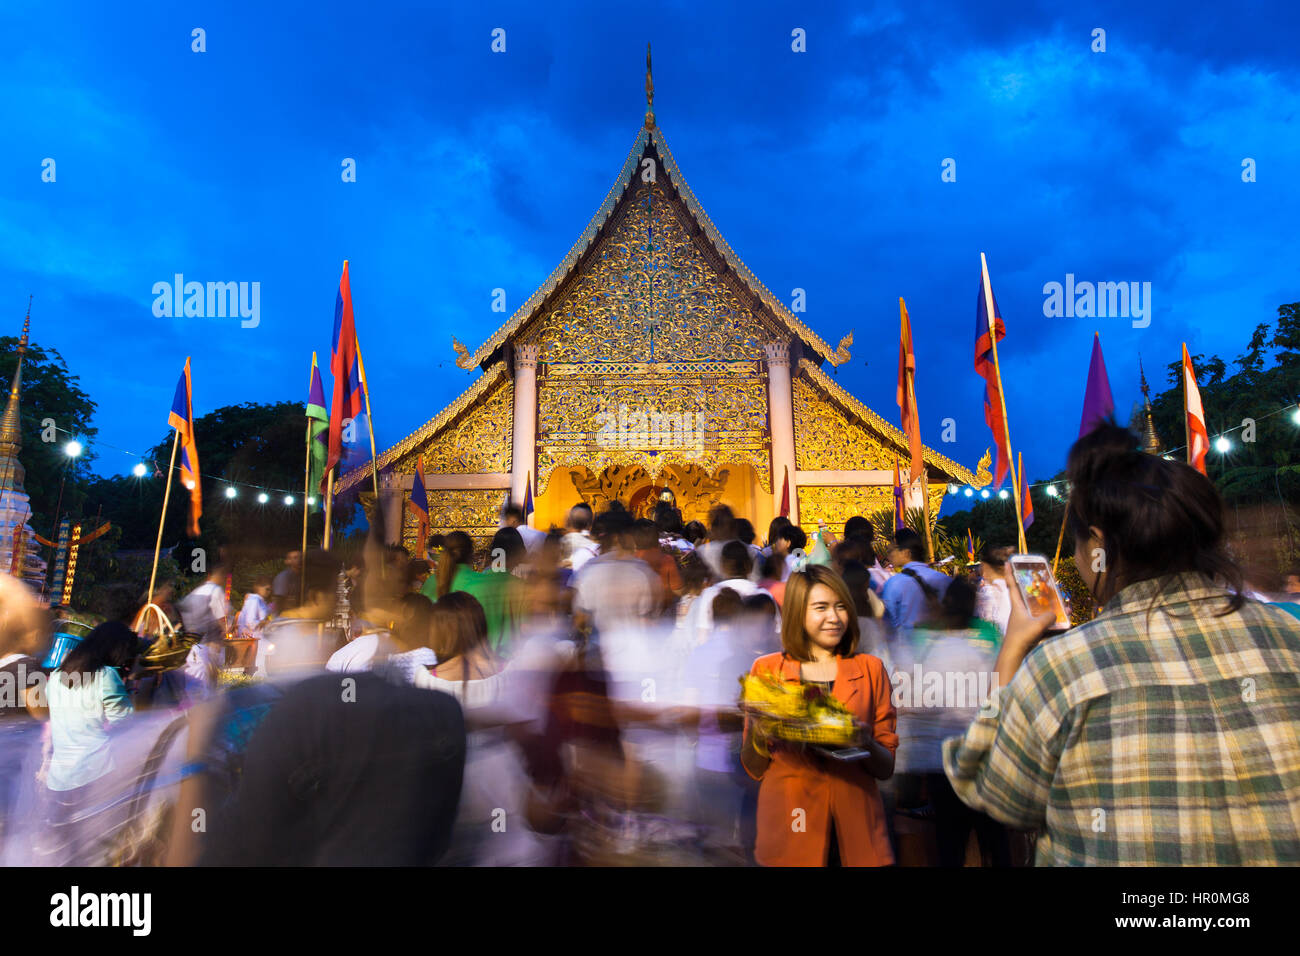 Chiang Mai, Thailand - 29 May, 2014: Crowd of people worshiping at Wat Chedi Luang during City Pillar Festival ( - Stock Image